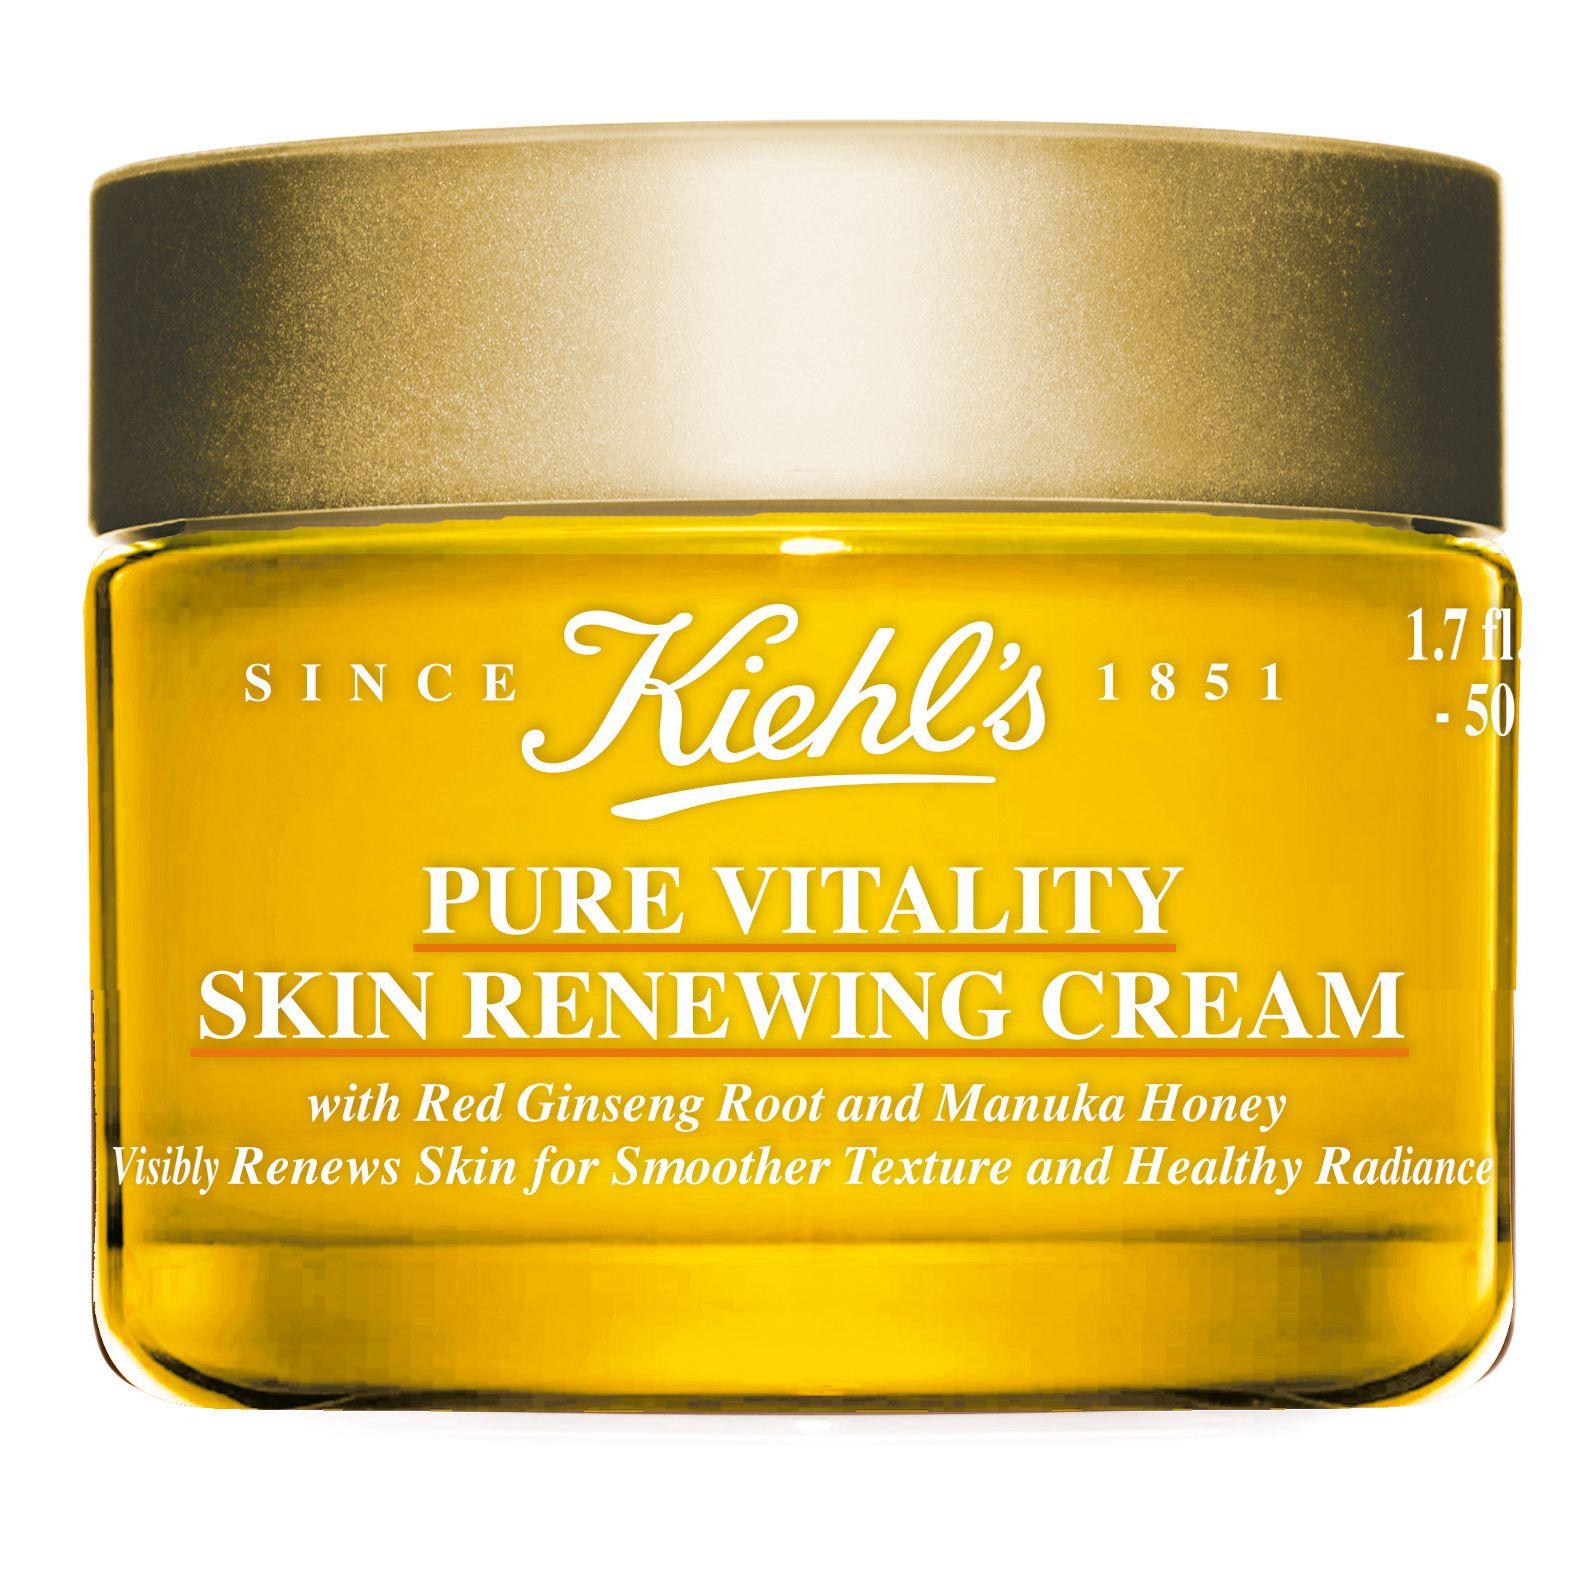 Kiehls Kiehl's Pure Vitality Skin Renewing Cream, 50ml